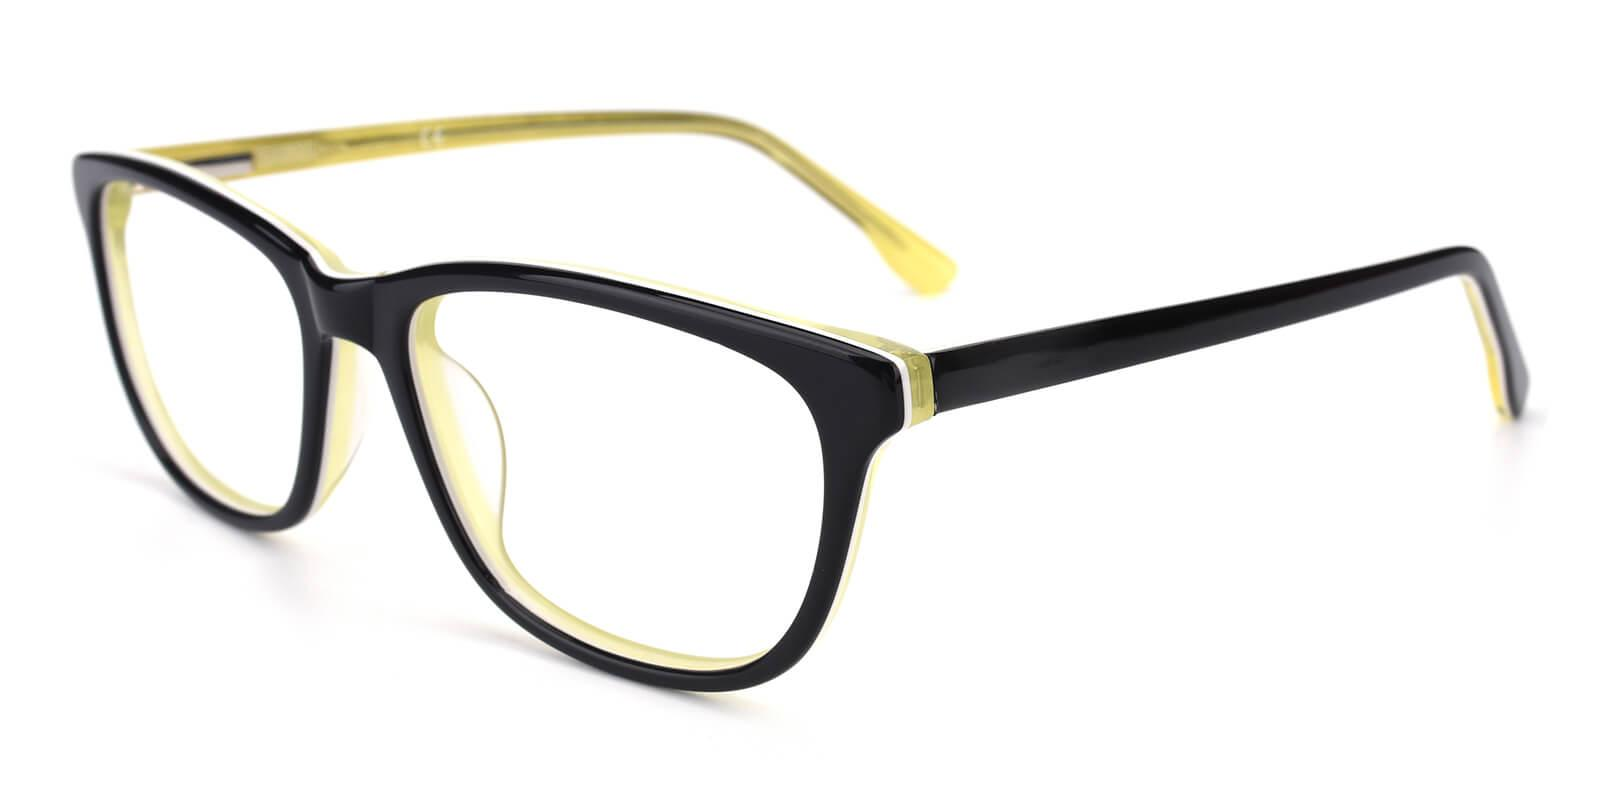 Emblem-Yellow-Square / Cat-Acetate-Eyeglasses-additional1